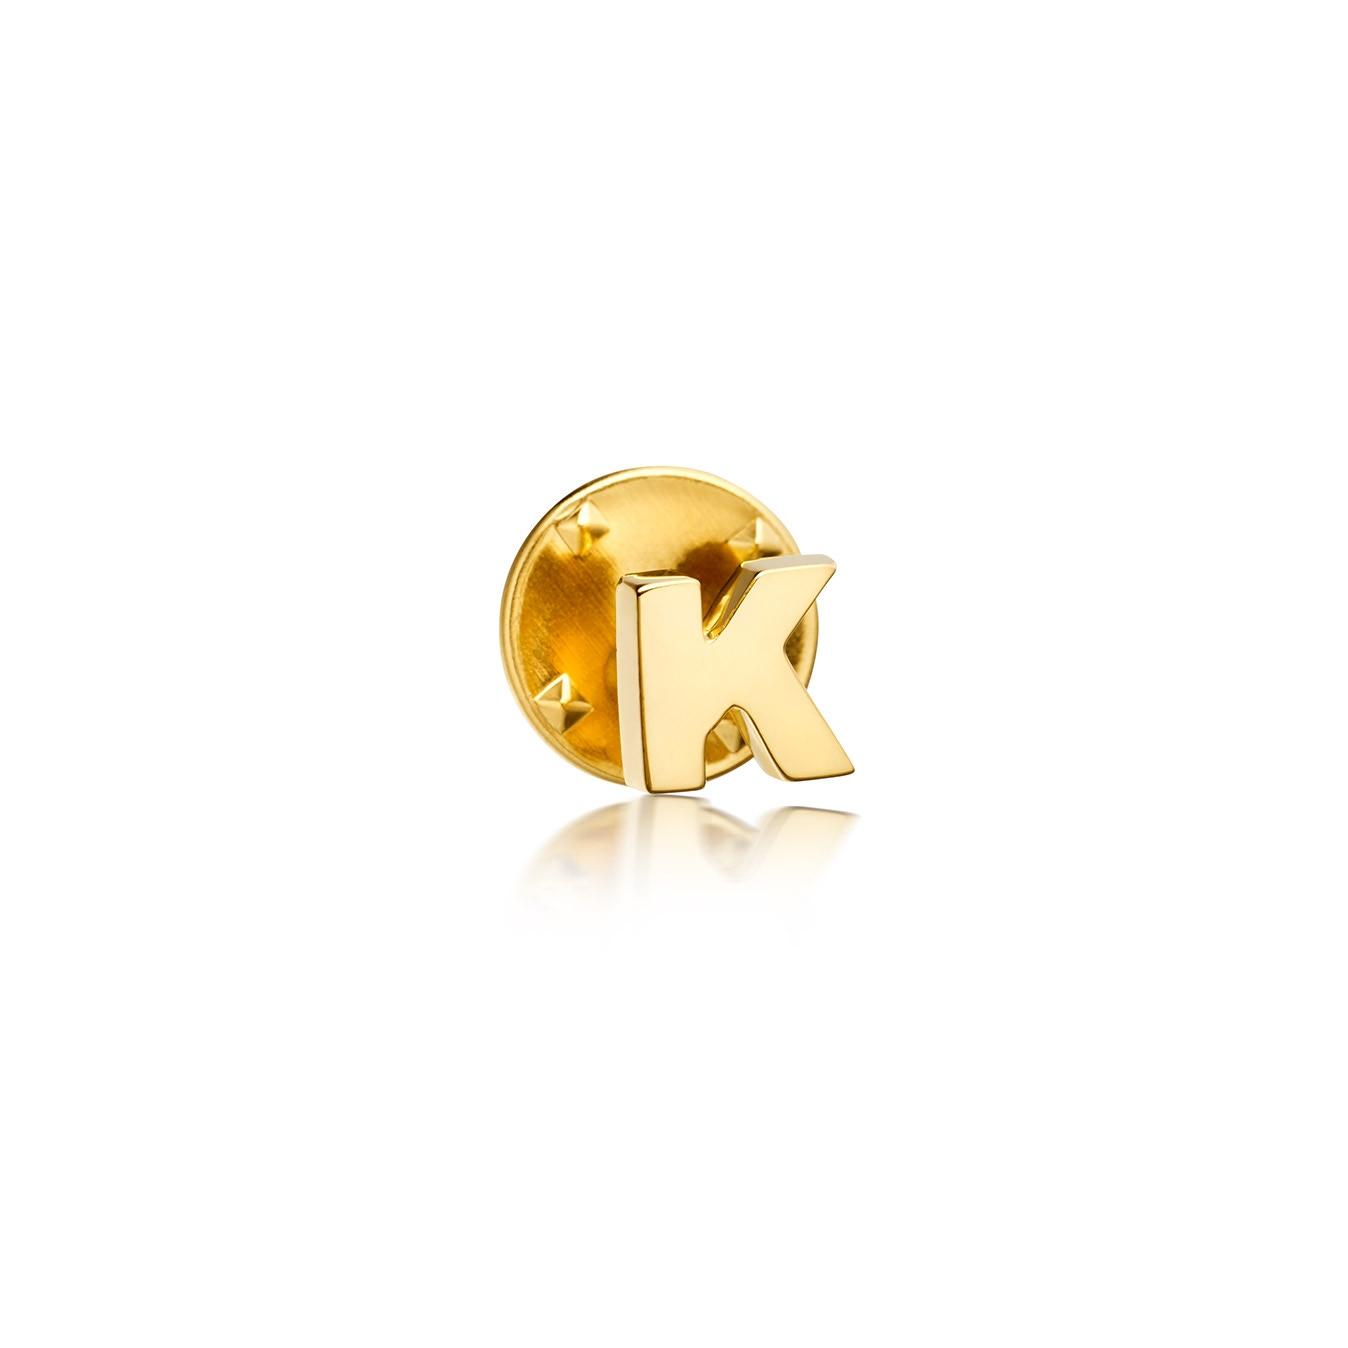 Initial 'K' Biography Pins